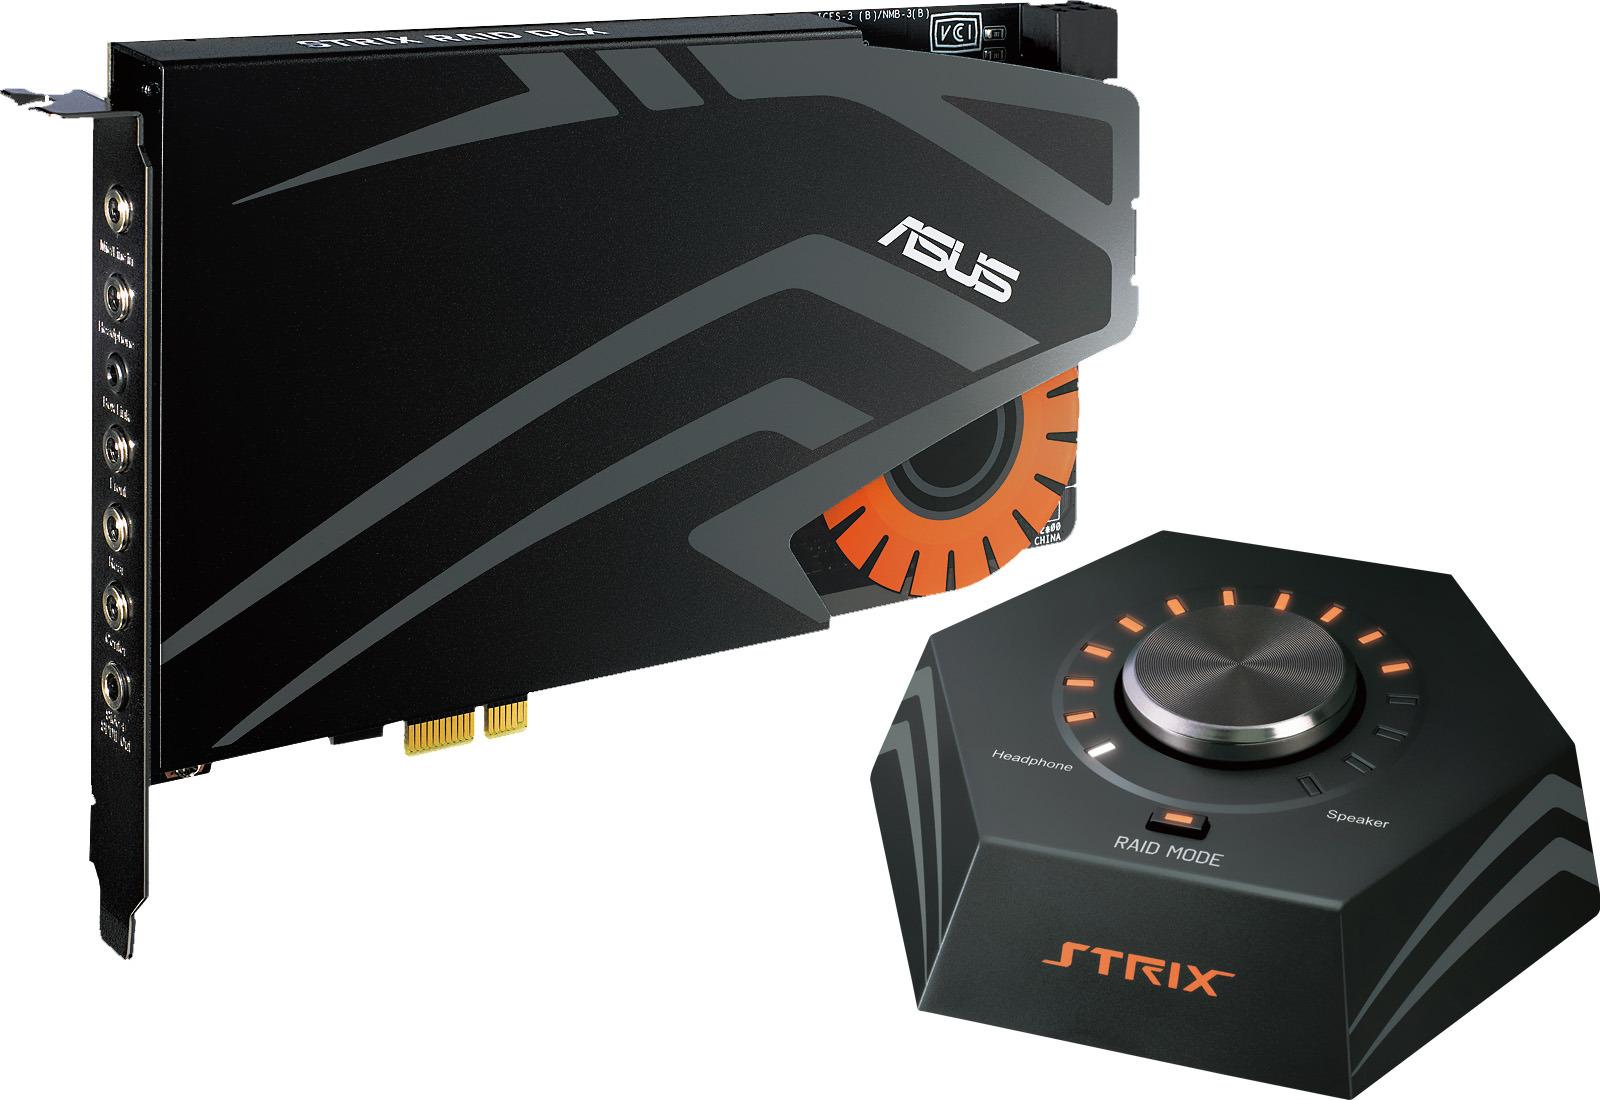 Звуковая карта ASUS Strix Raid DLX (C-Media 6632AX), STRIX RAID DLX цена и фото